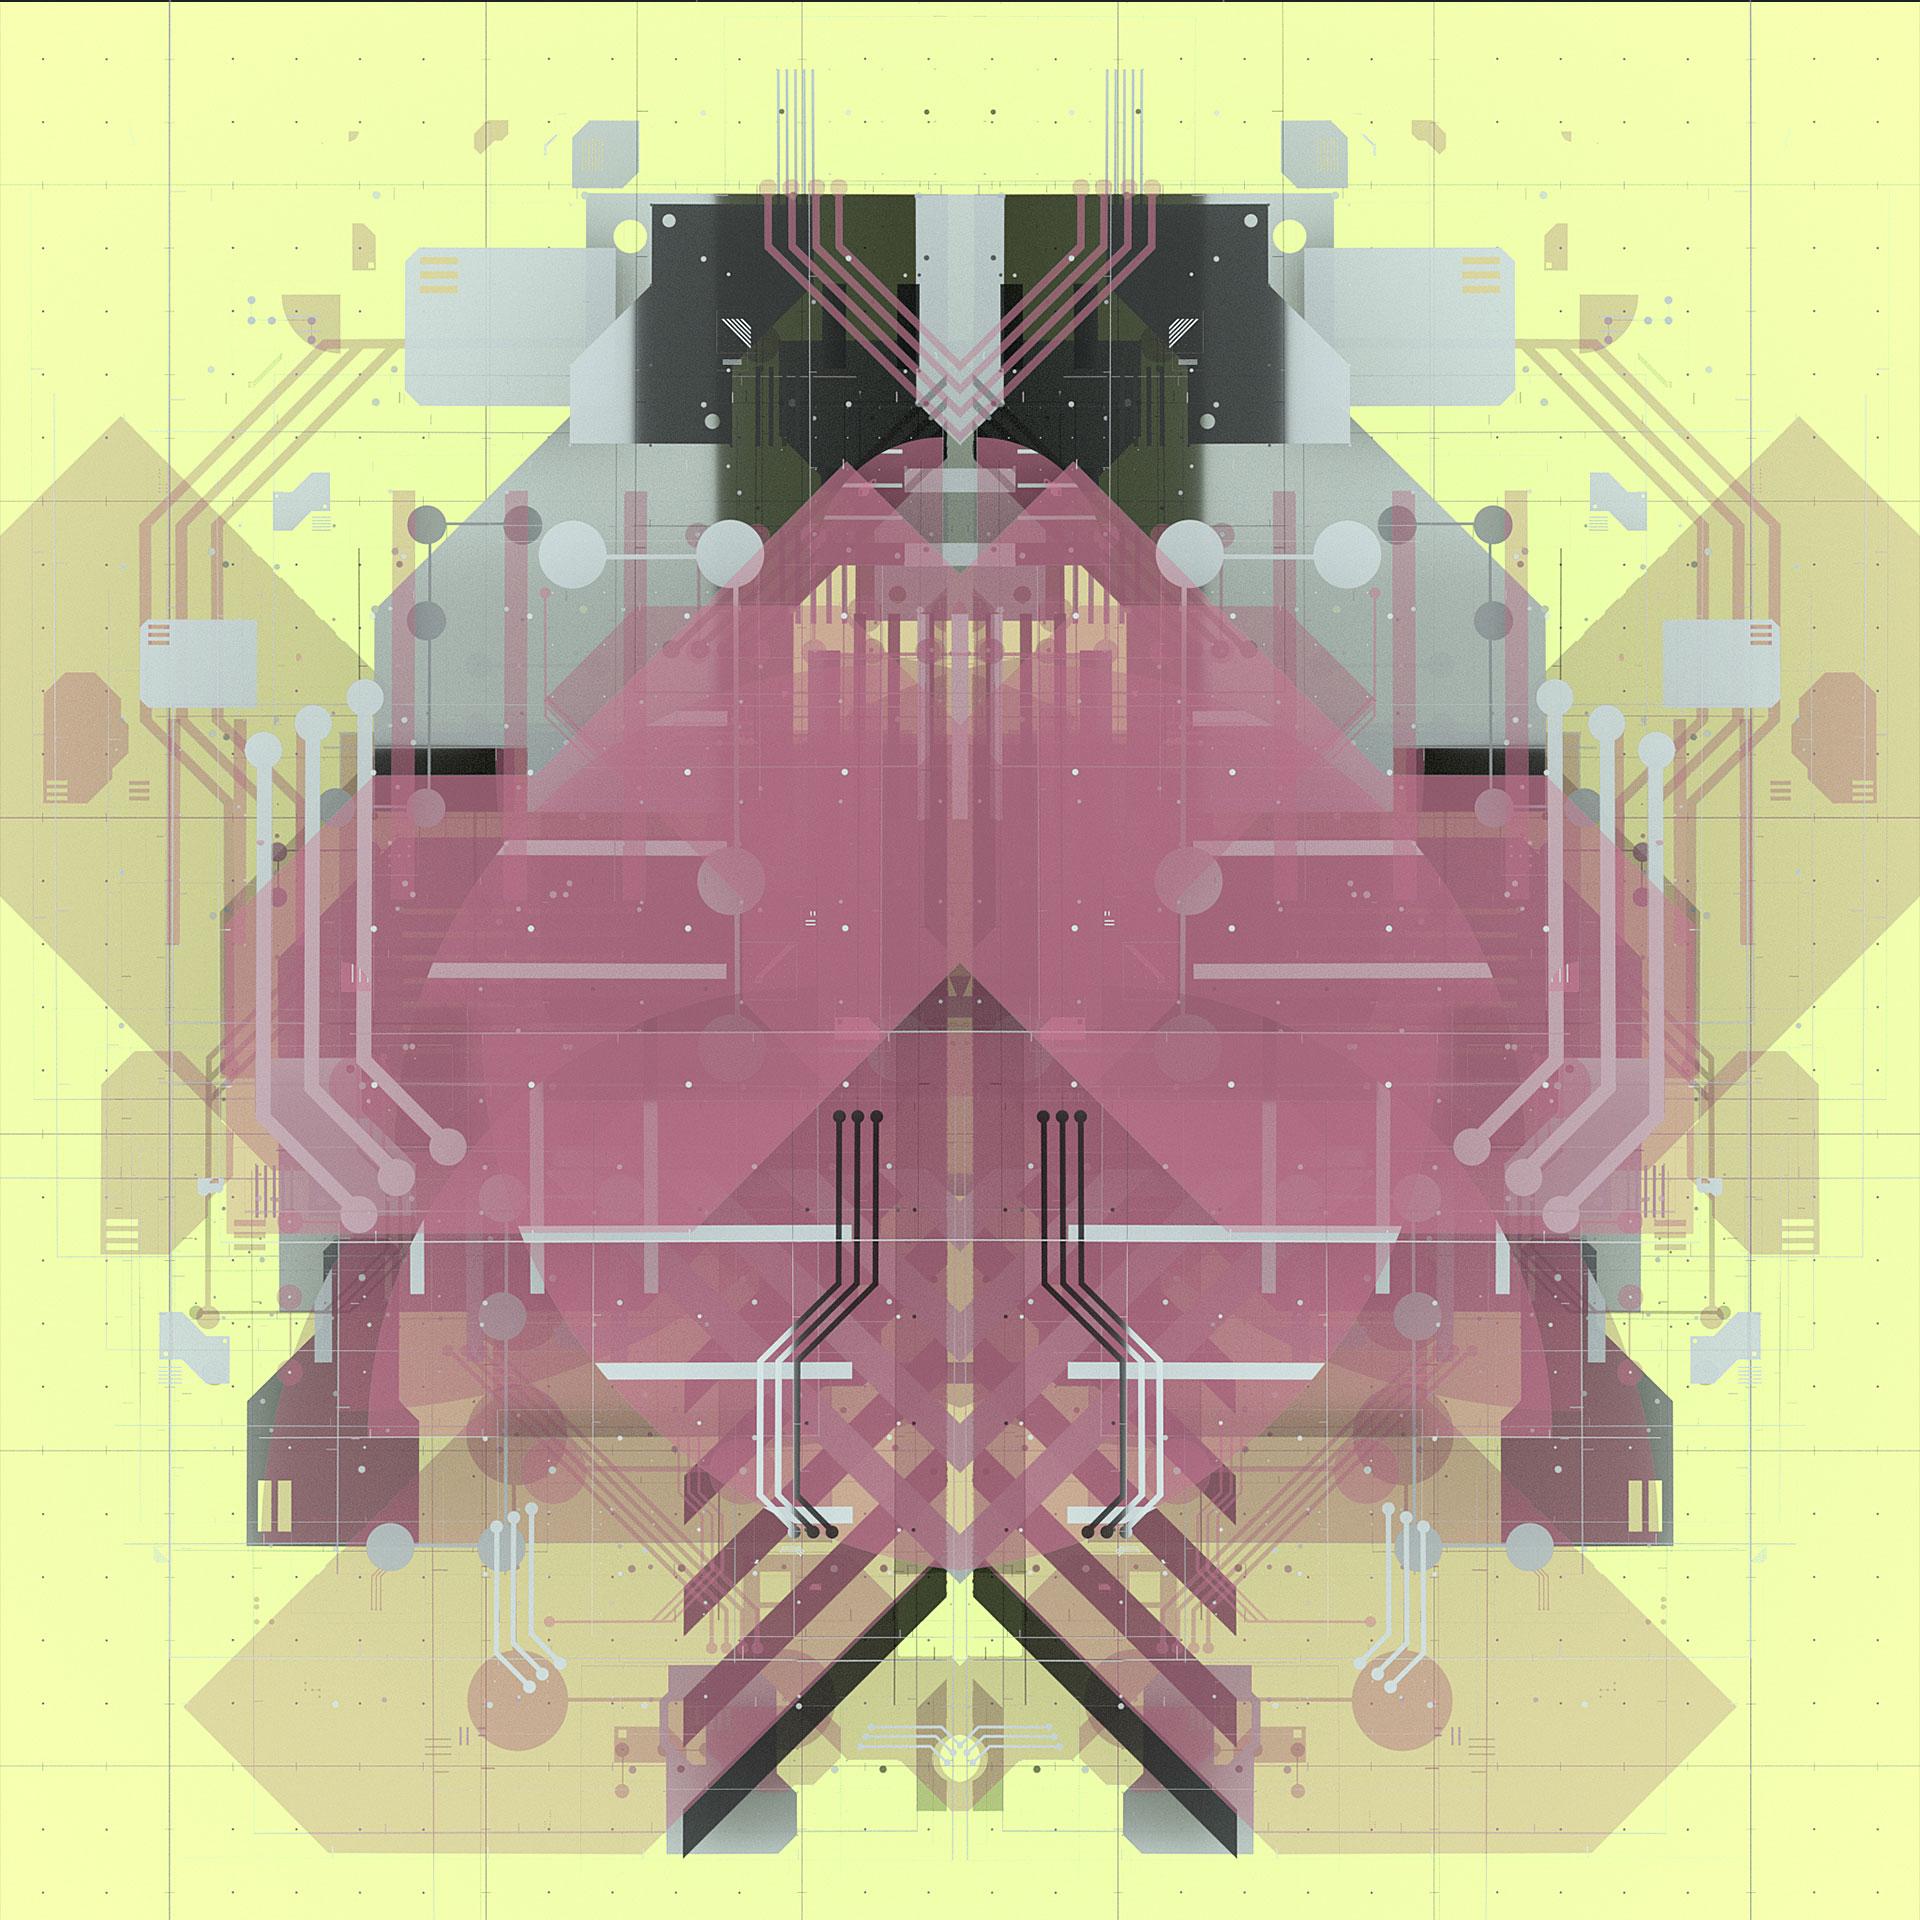 Mantis_example_5